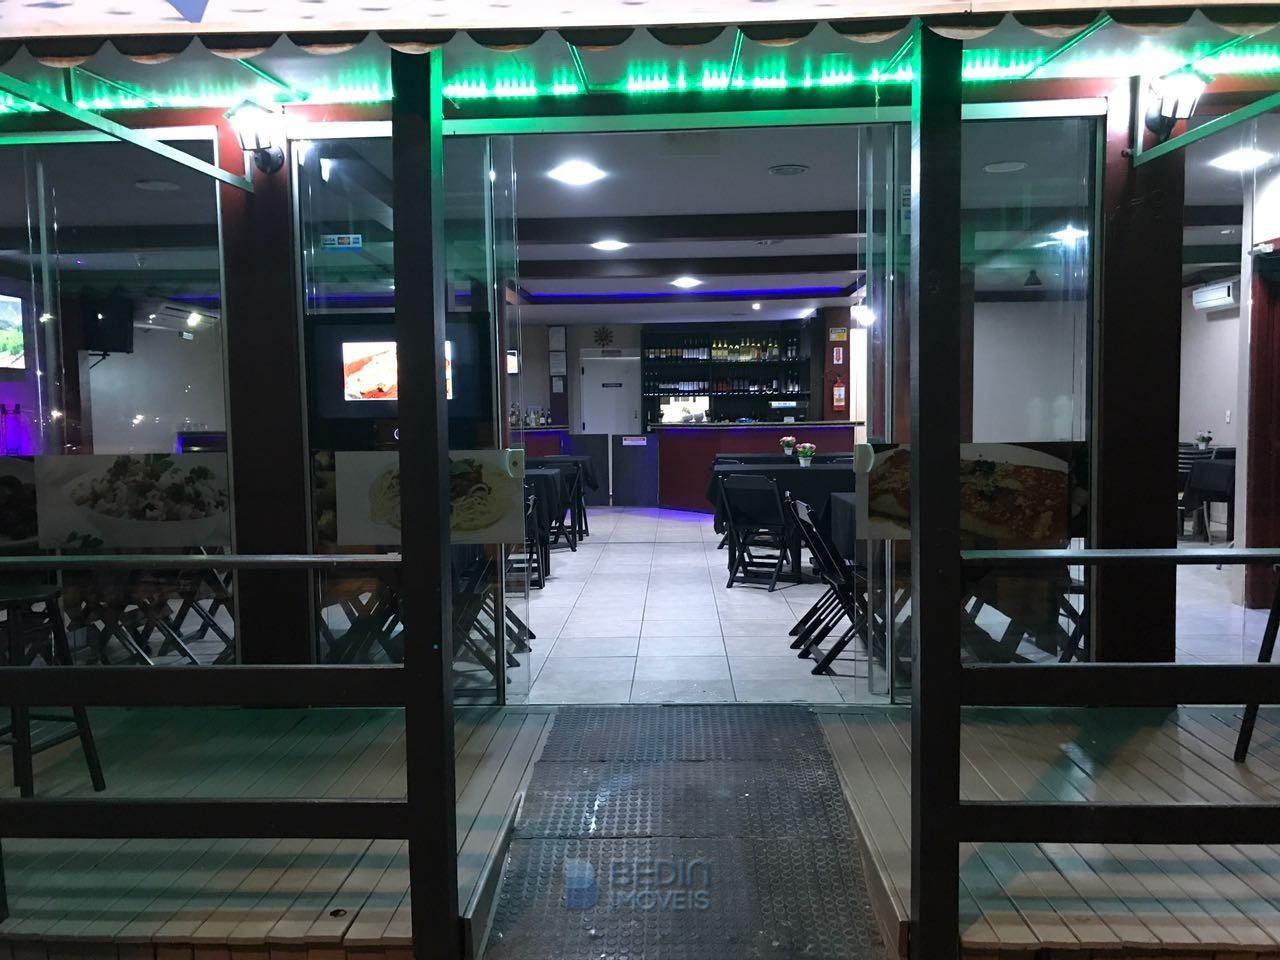 Restaurante Bedin Imóveis